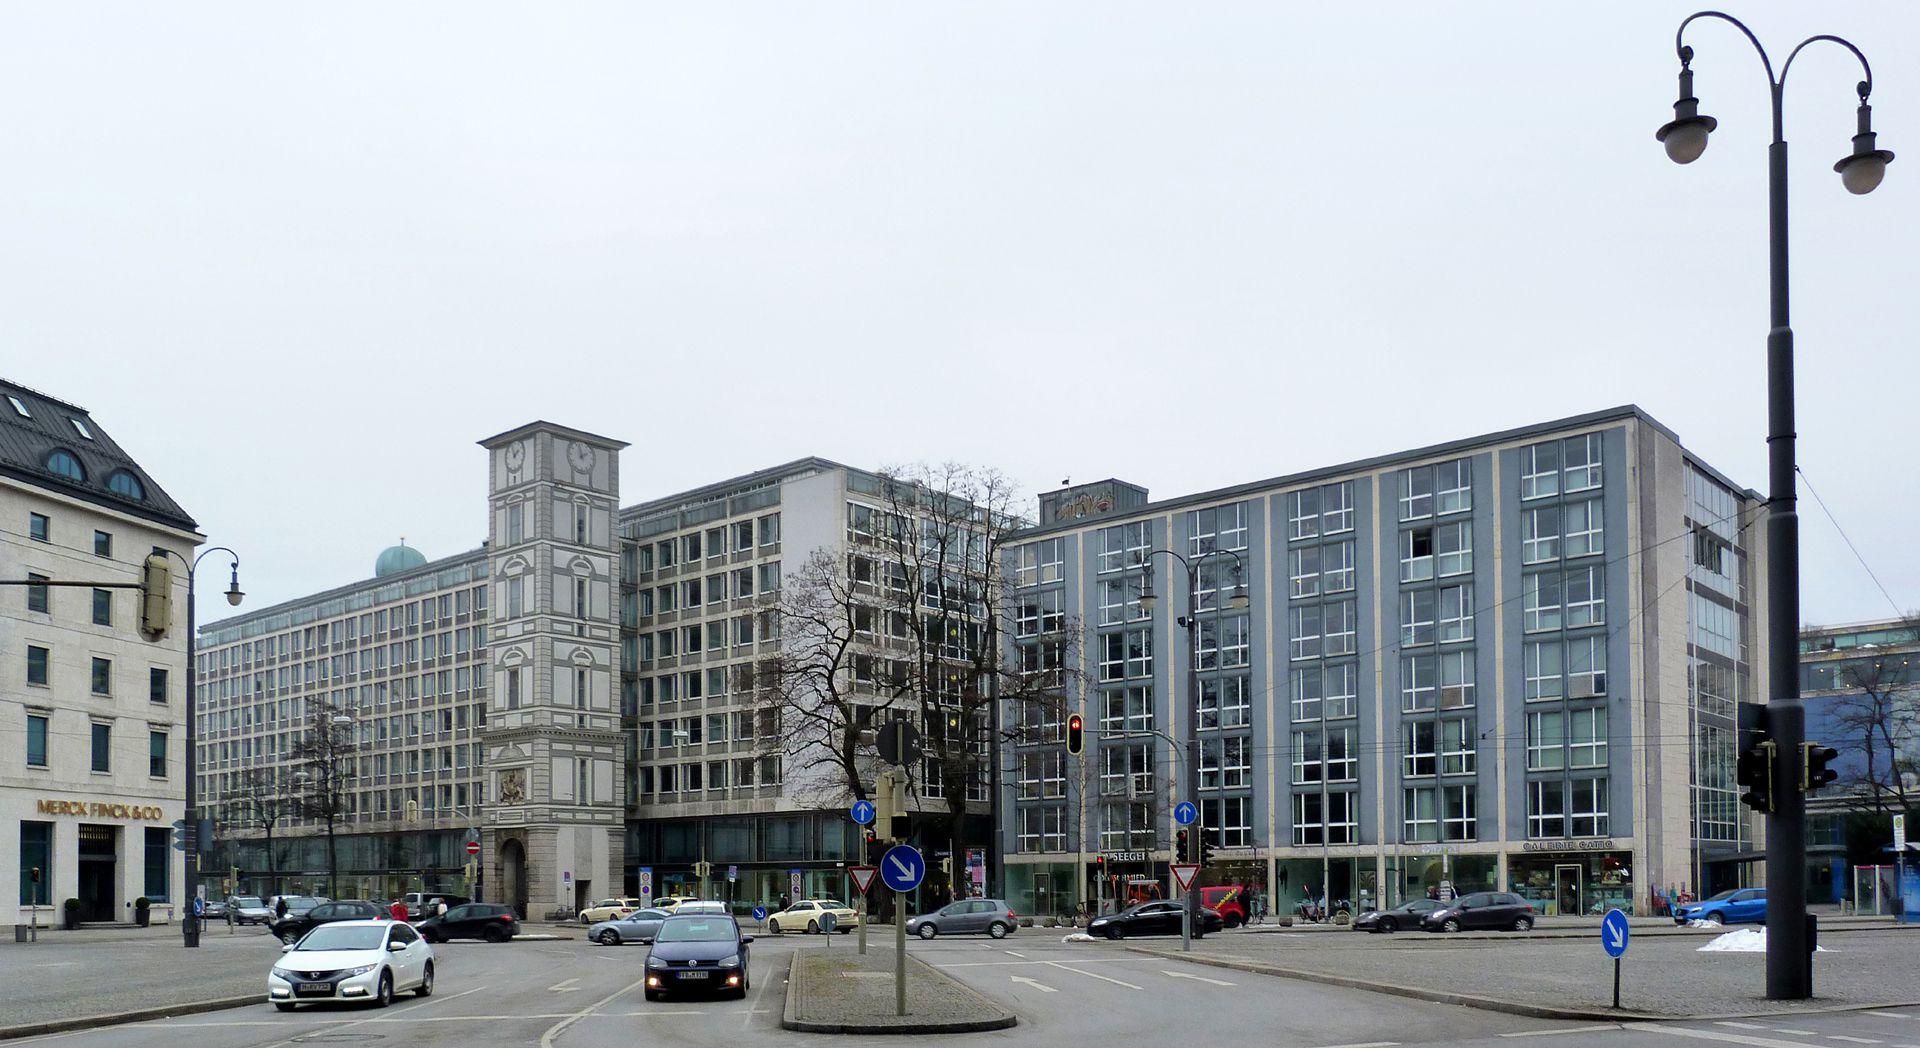 Herzog-Max-Burg, (Herzog-Max-Castle) Munich, Court Building Total view